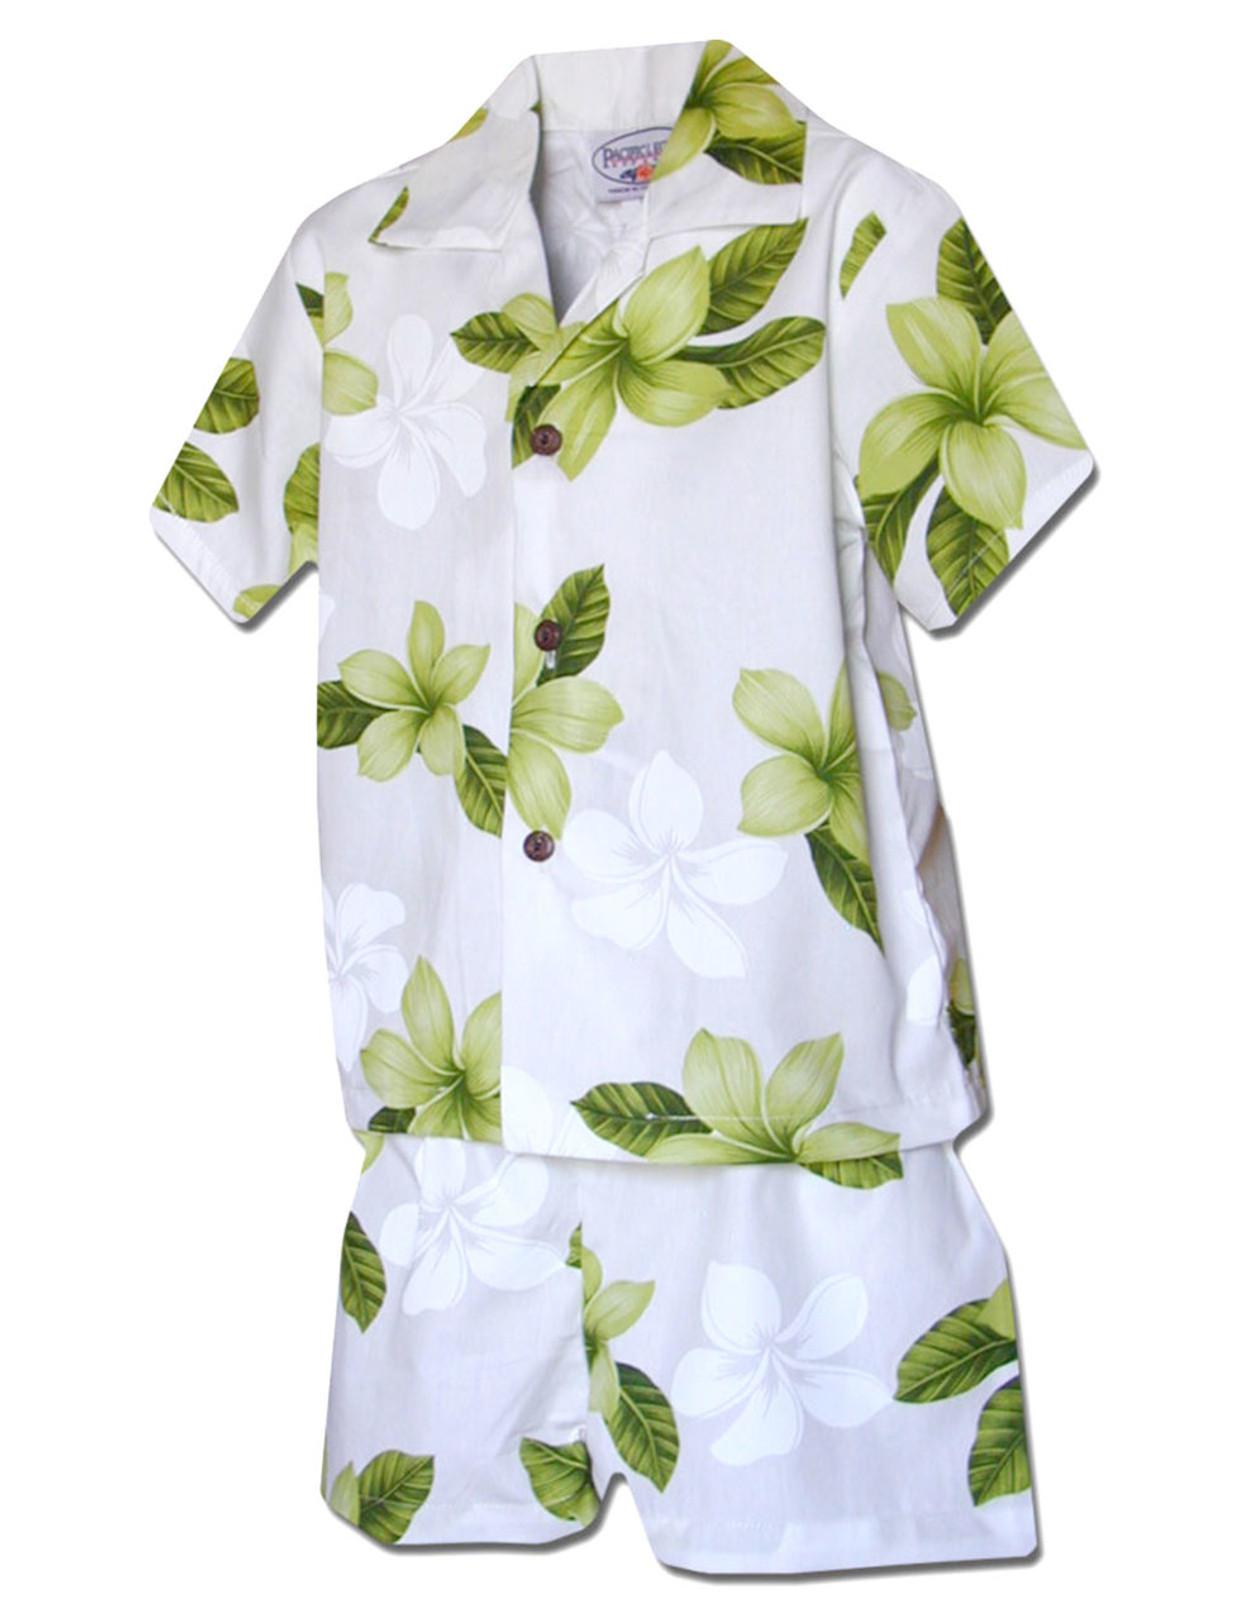 9cd83d99 Toddler Clothes Boys Set Koala Hibiscus 100% Cotton Fabric Matching Shorts  and Shirt Set Coconut